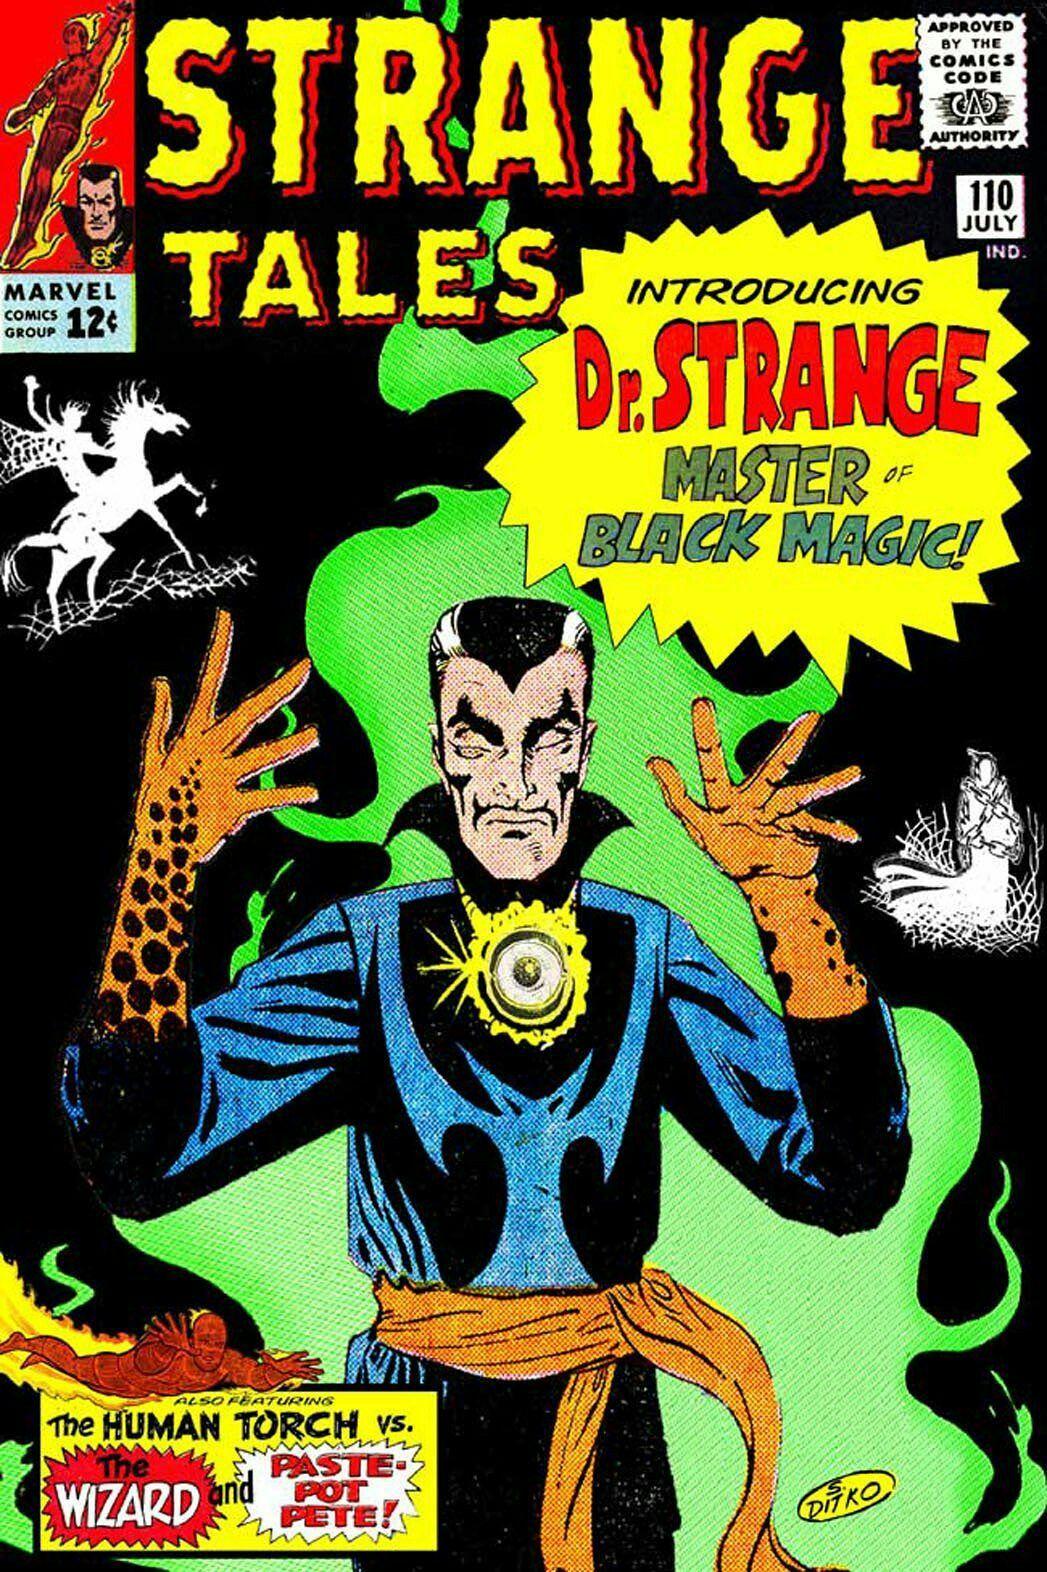 strange-tales-110.jpg